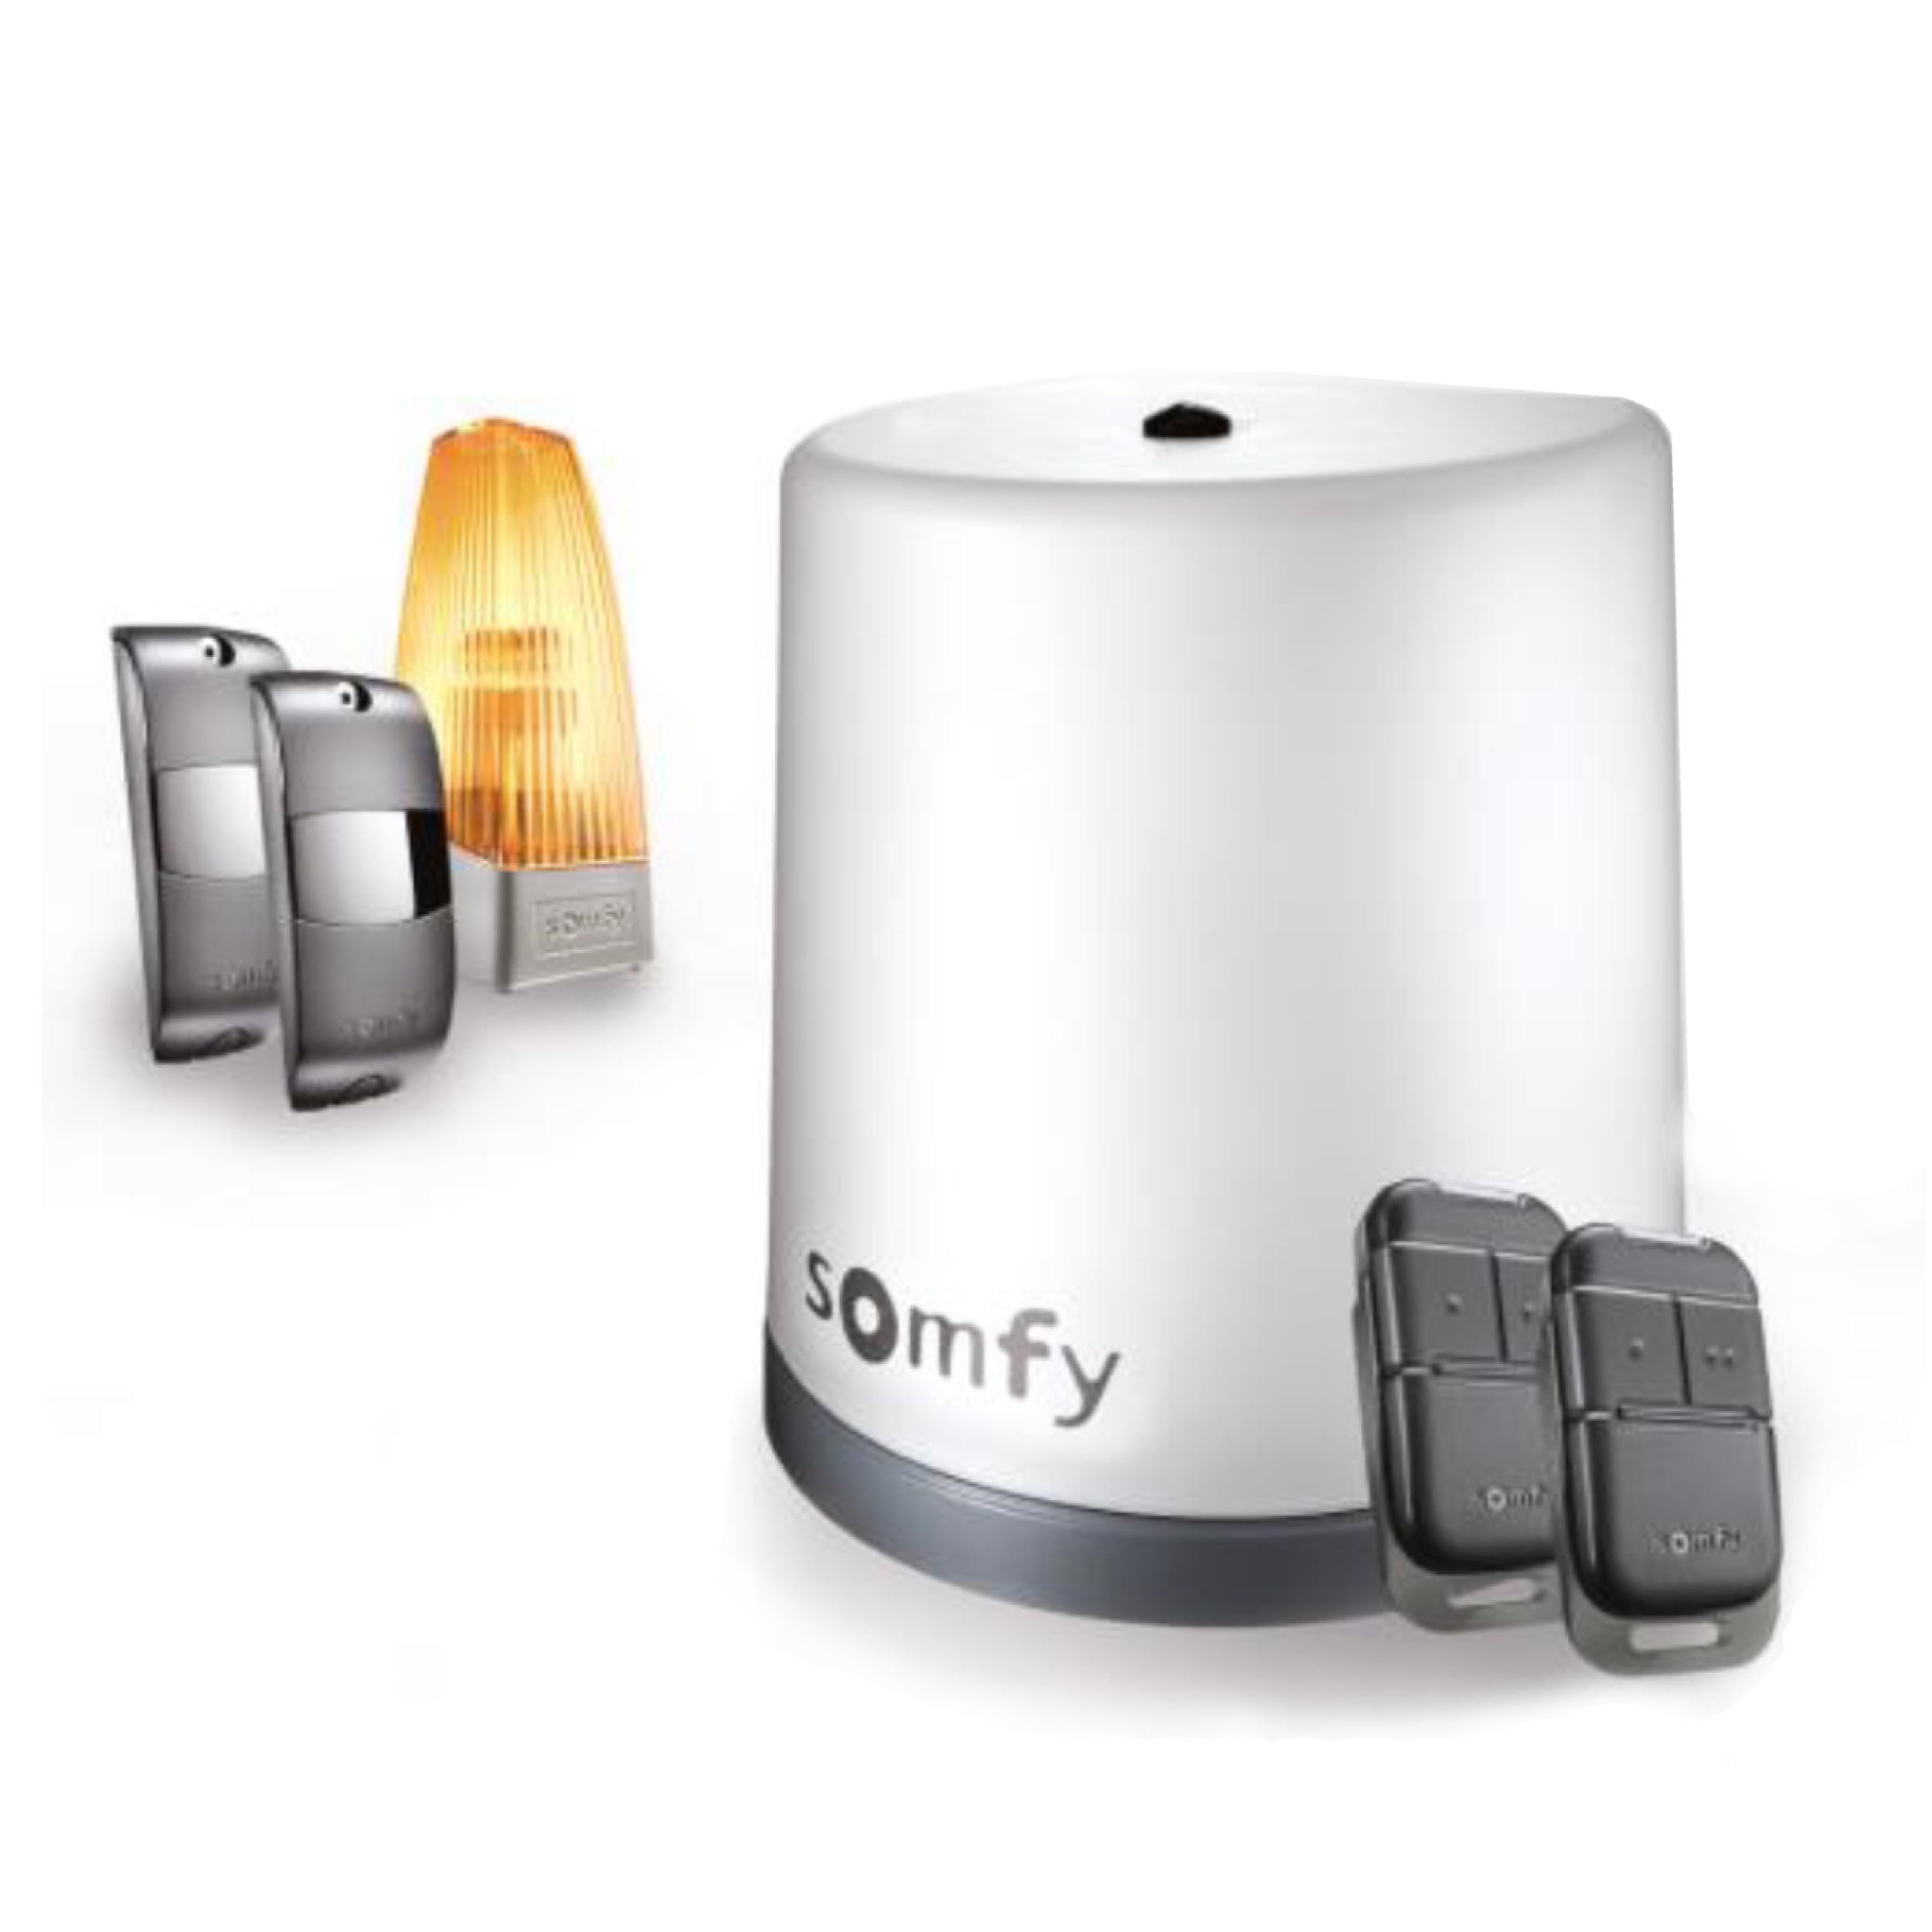 kit motorisation pour coulissant freevia 390 by somfy. Black Bedroom Furniture Sets. Home Design Ideas